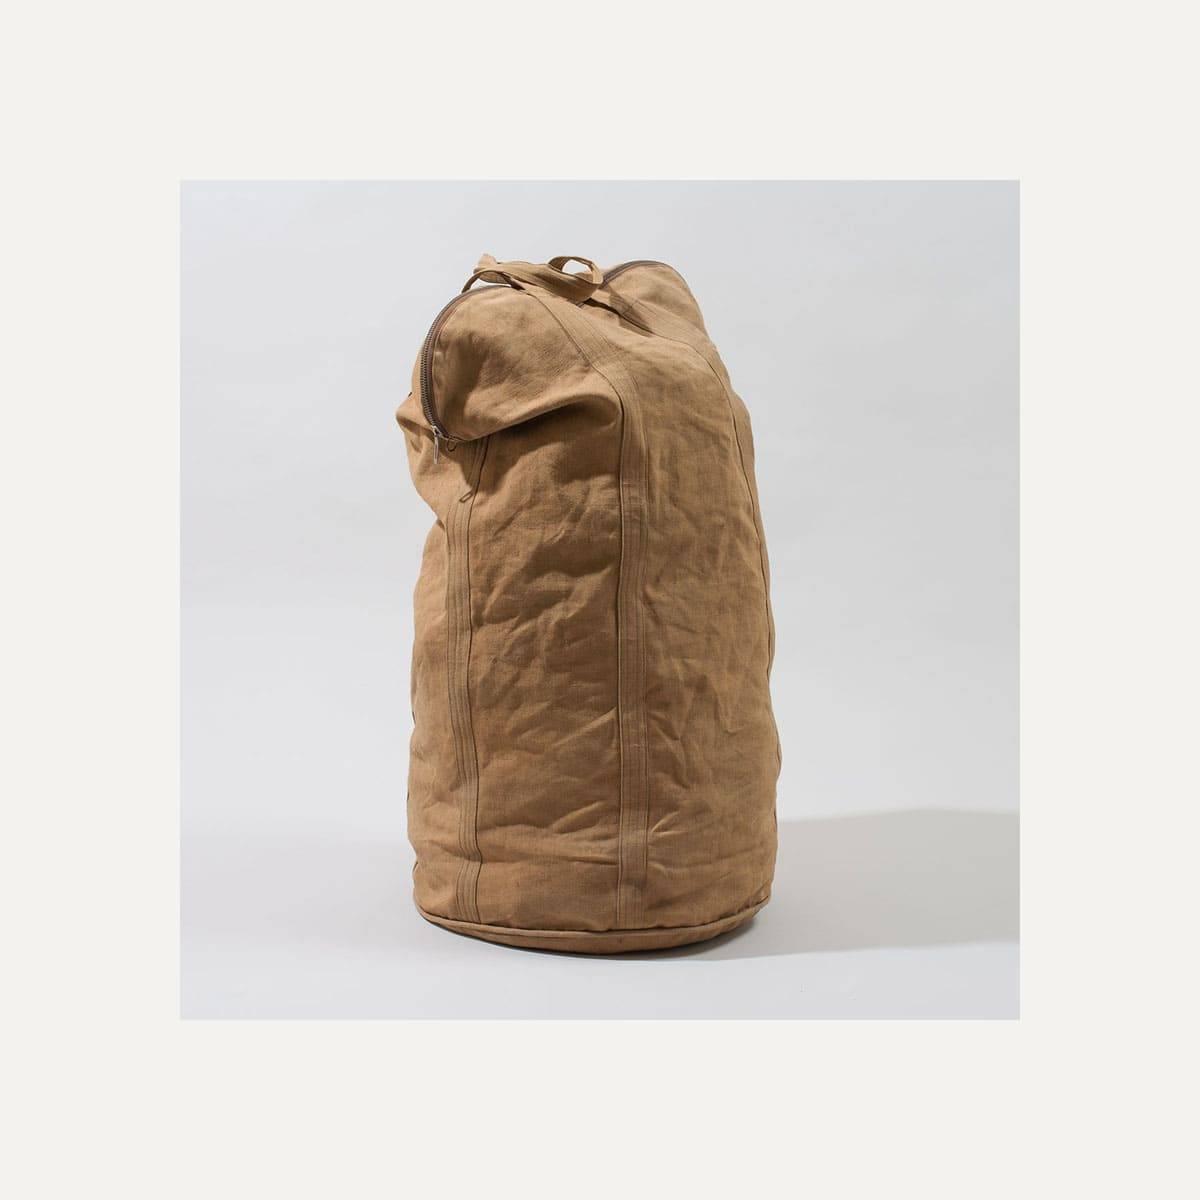 N°4: 'Cashew-colored' linen parachute bag (image n°2)